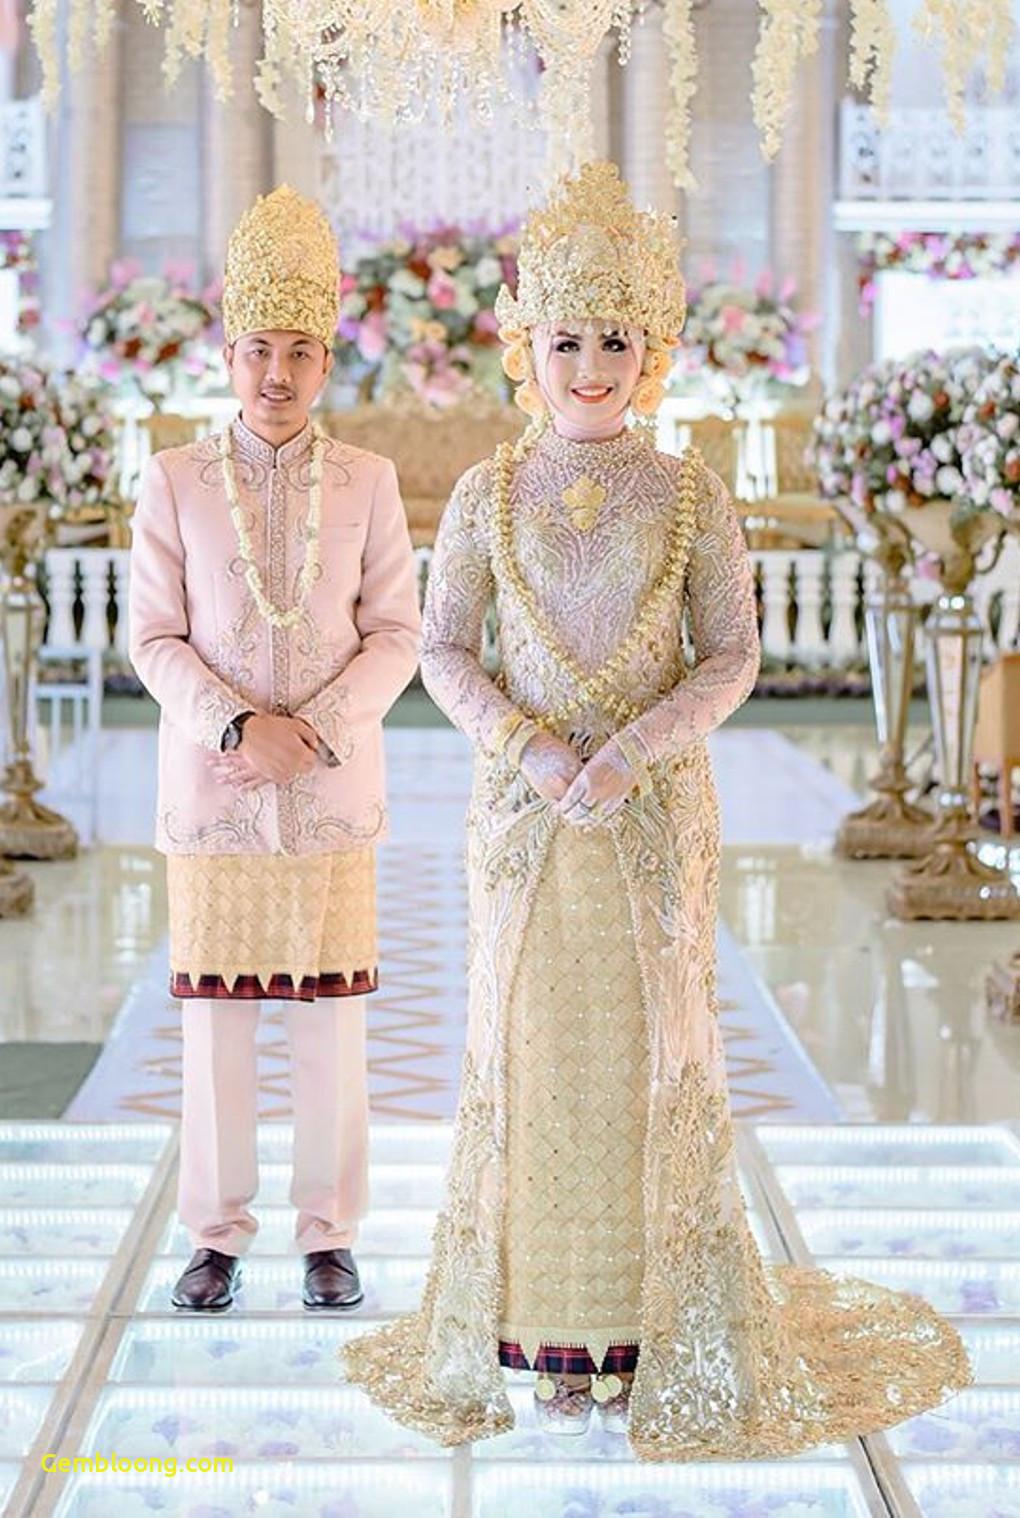 Gaun Sederhana Pengantin Berhijab New 20 Inspirasi Gaun Pernikahan Untuk Calon Pengantin Berhijab